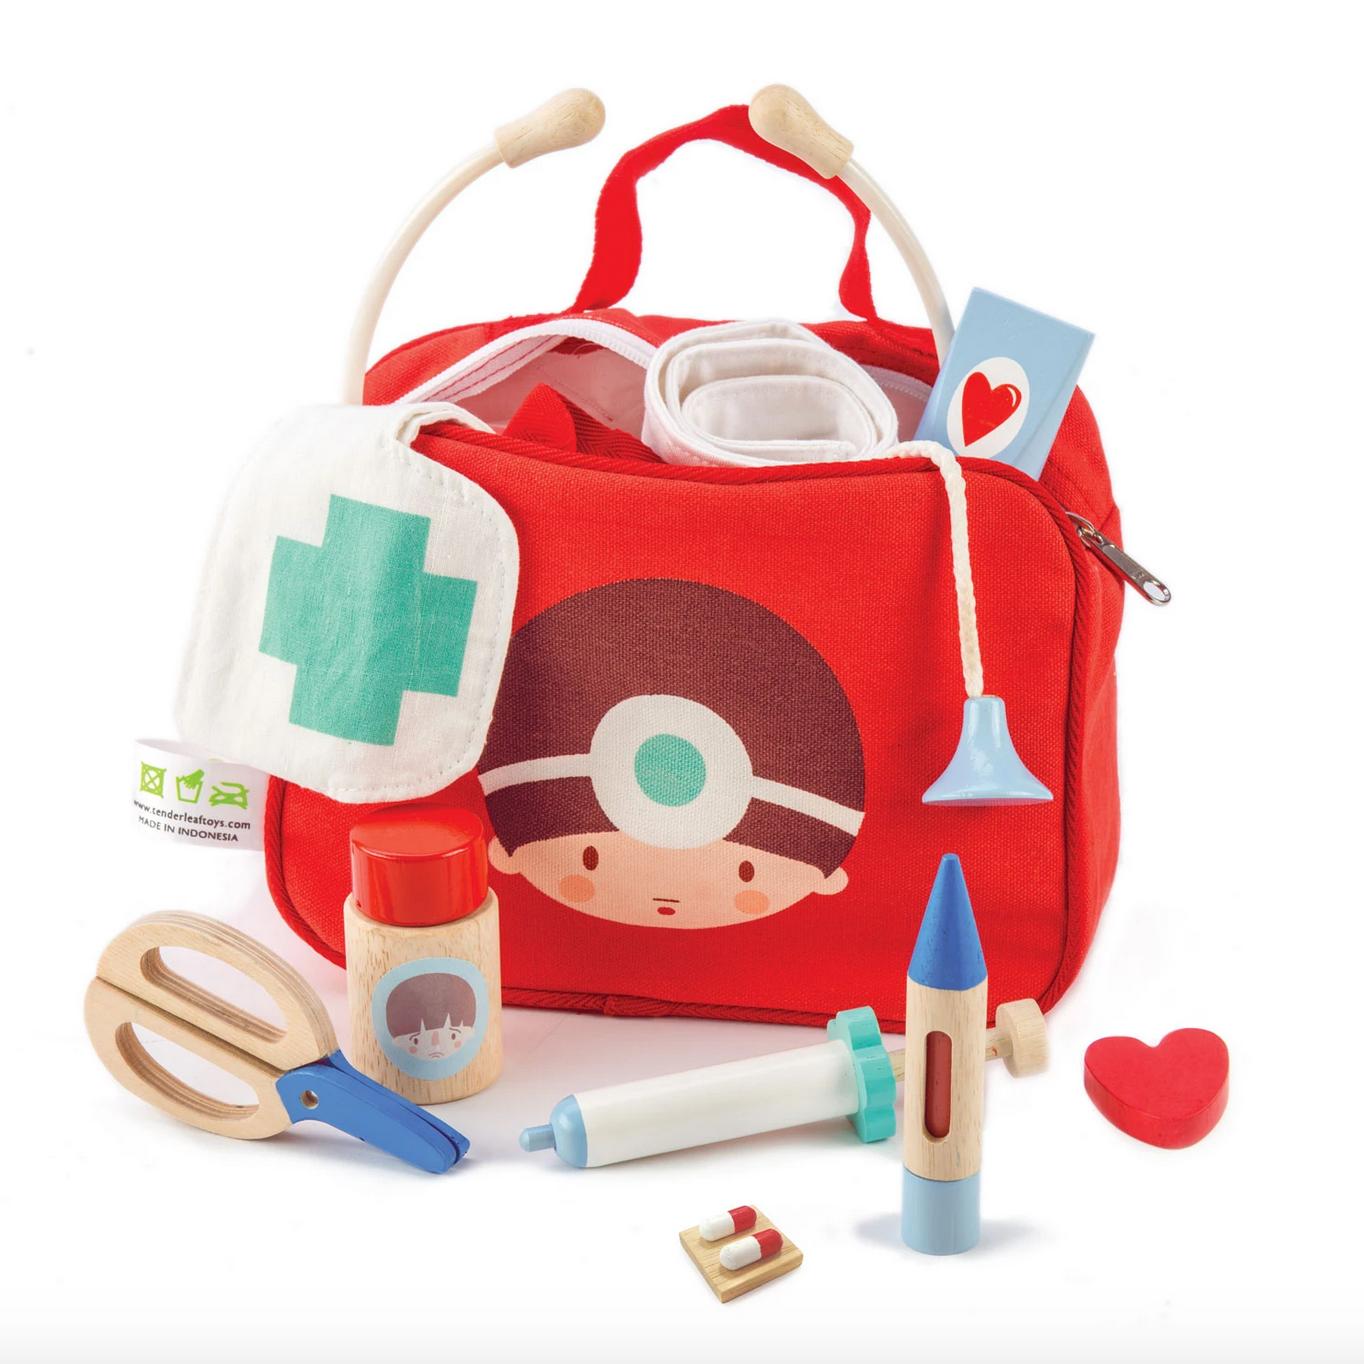 Doctos and Nurses Set